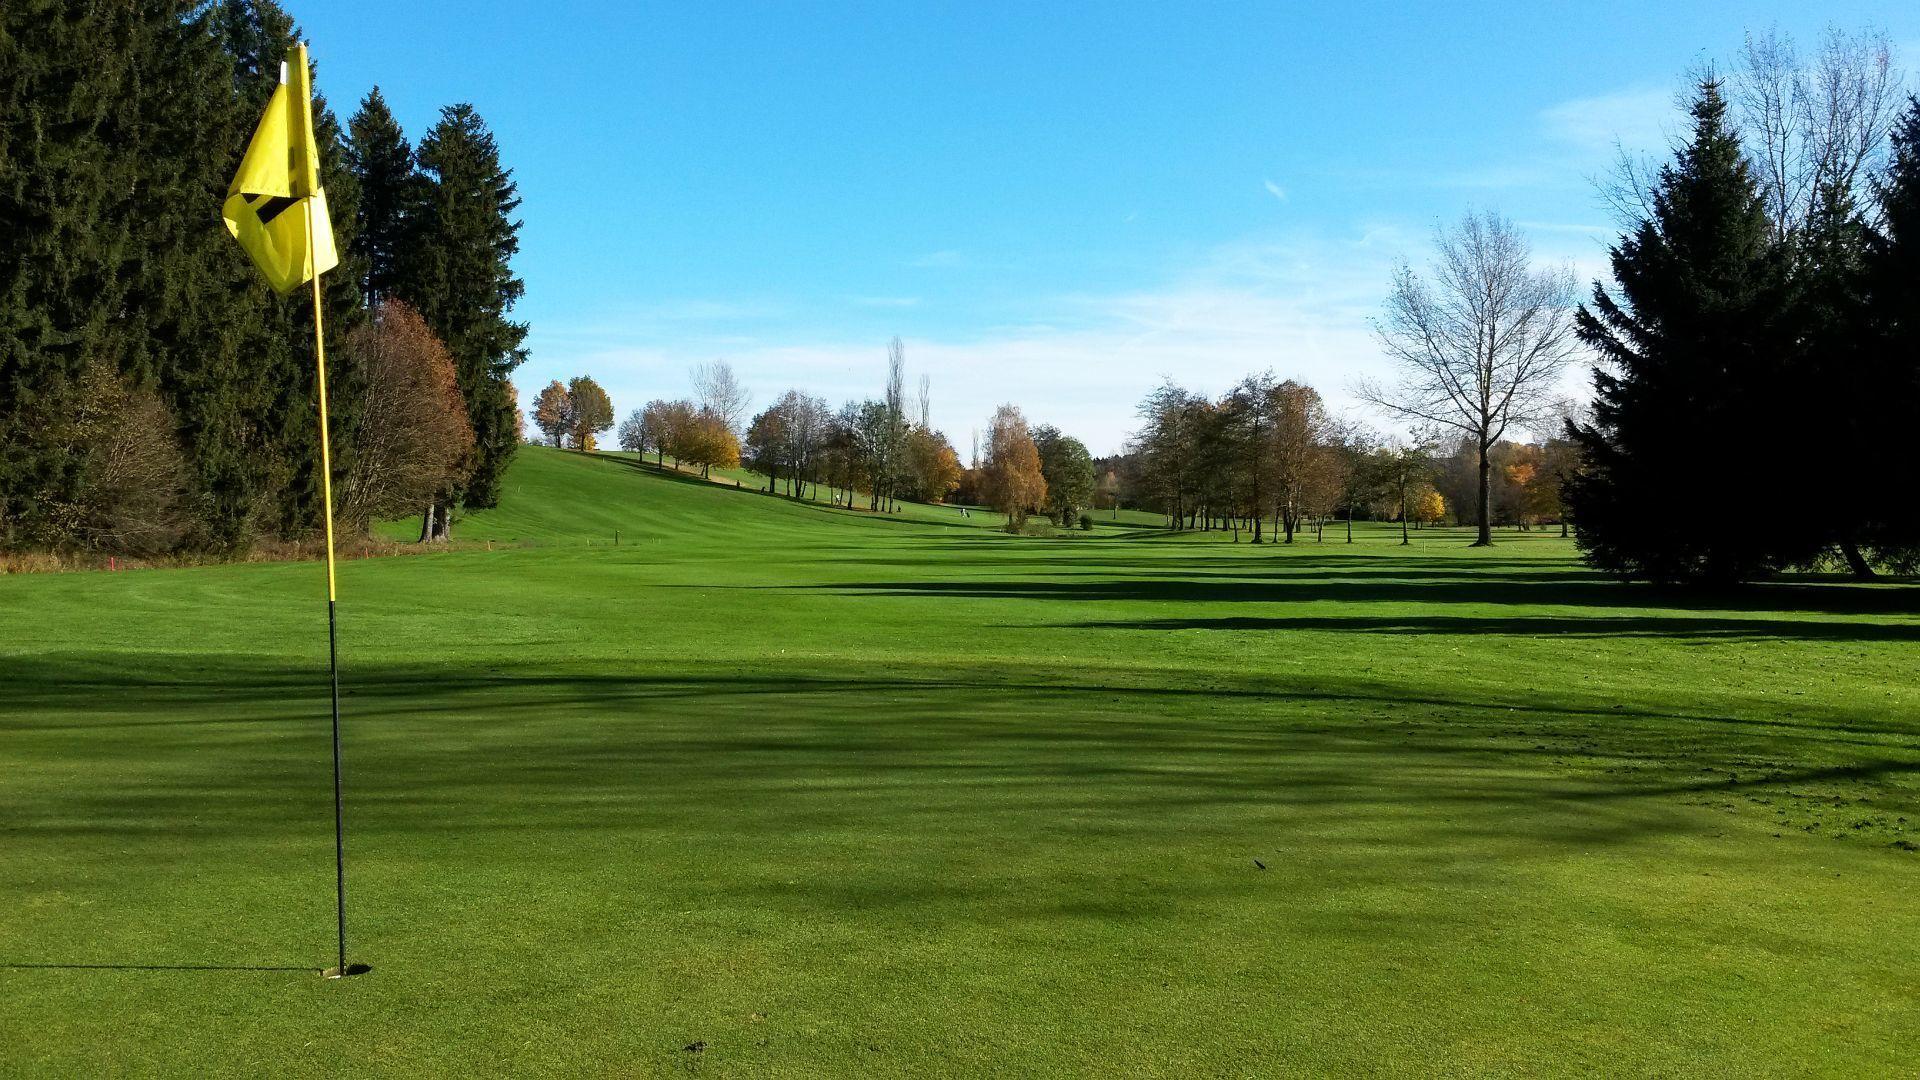 Golfplatz in Ottobeuren